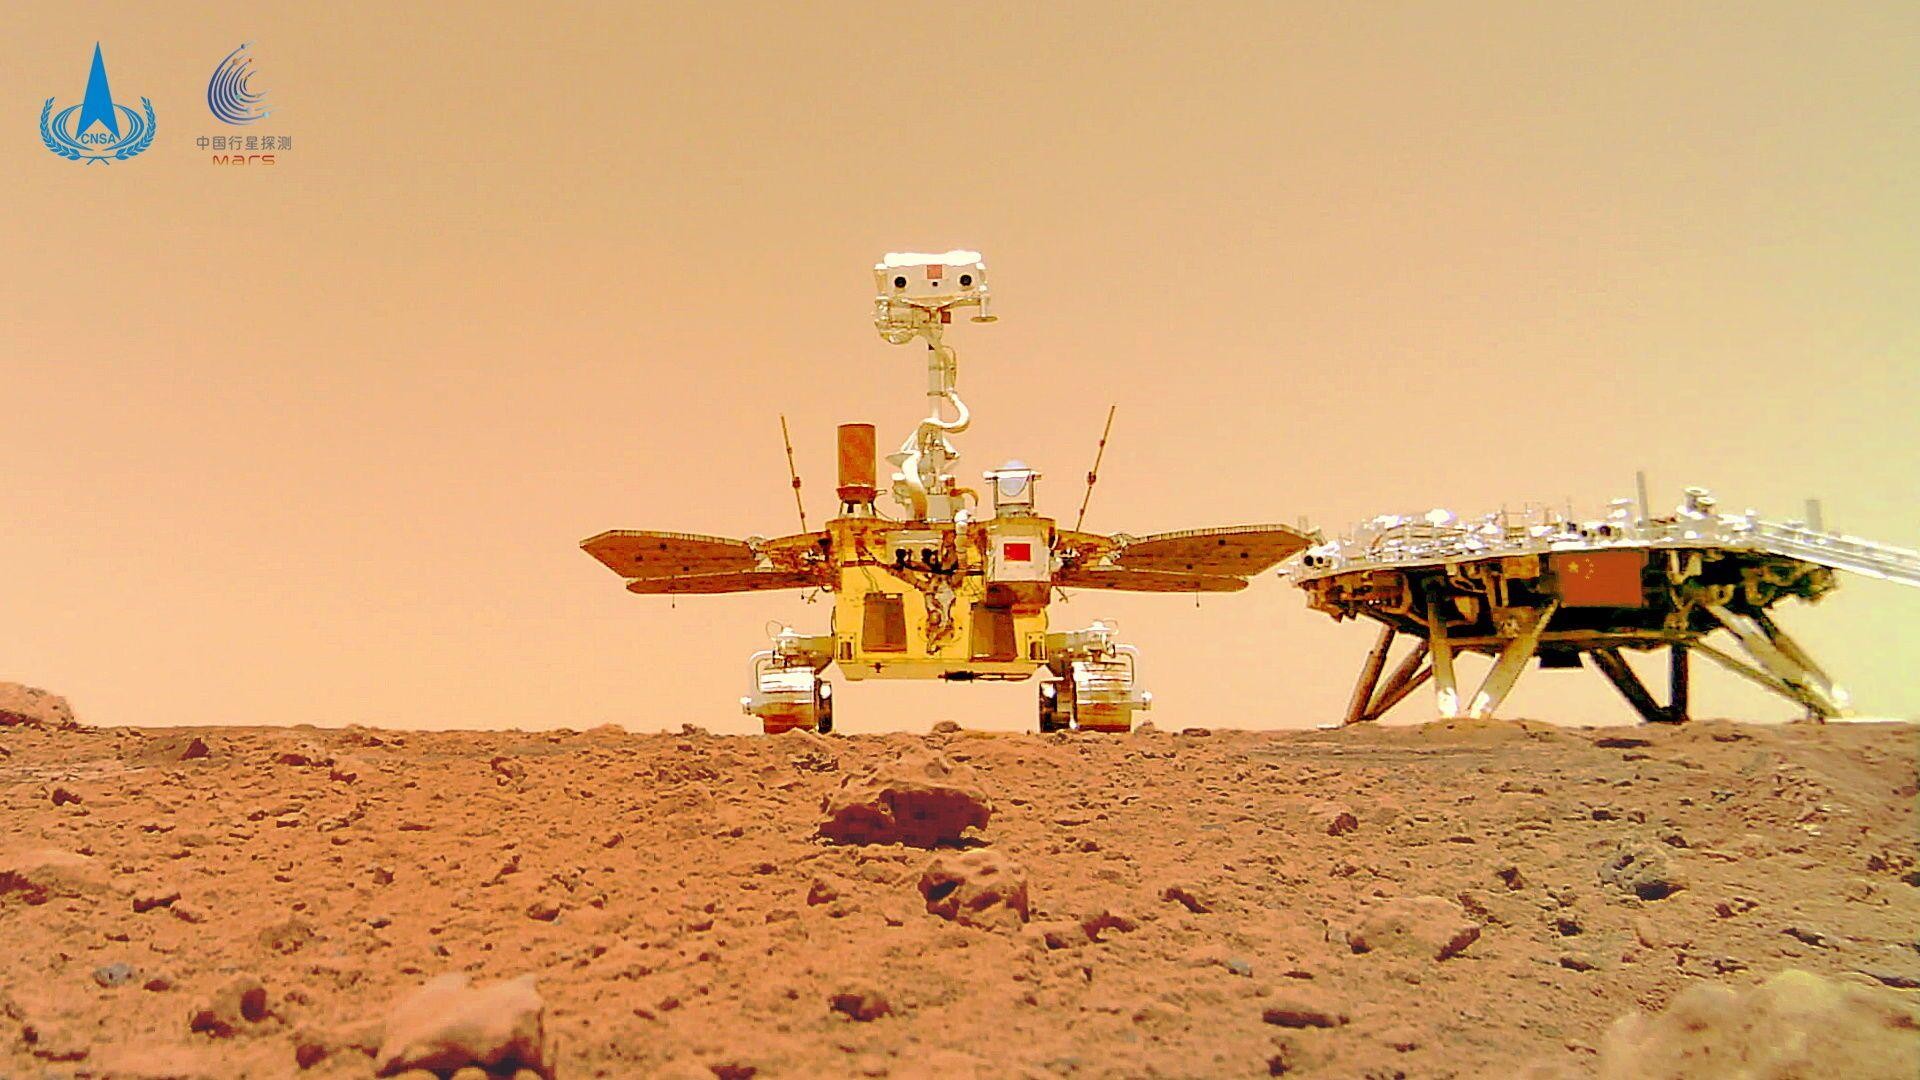 Il rover marziano cinese Zhurong - Sputnik Italia, 1920, 27.06.2021